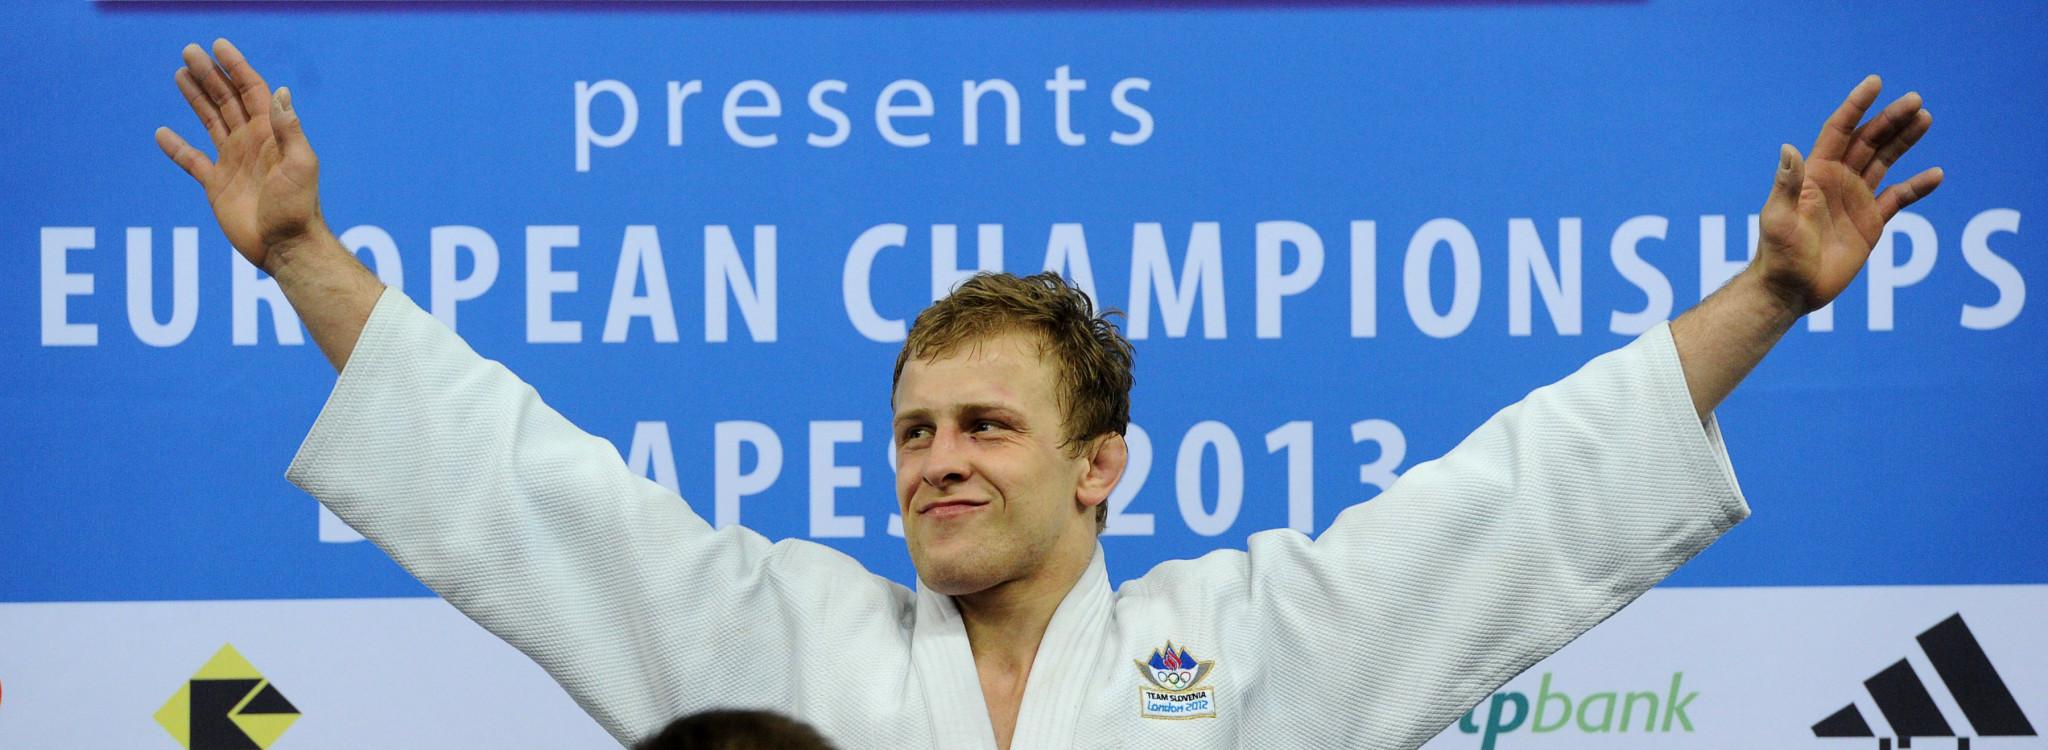 Rok Drakšič will lead the Finnish judo team ©Getty Images